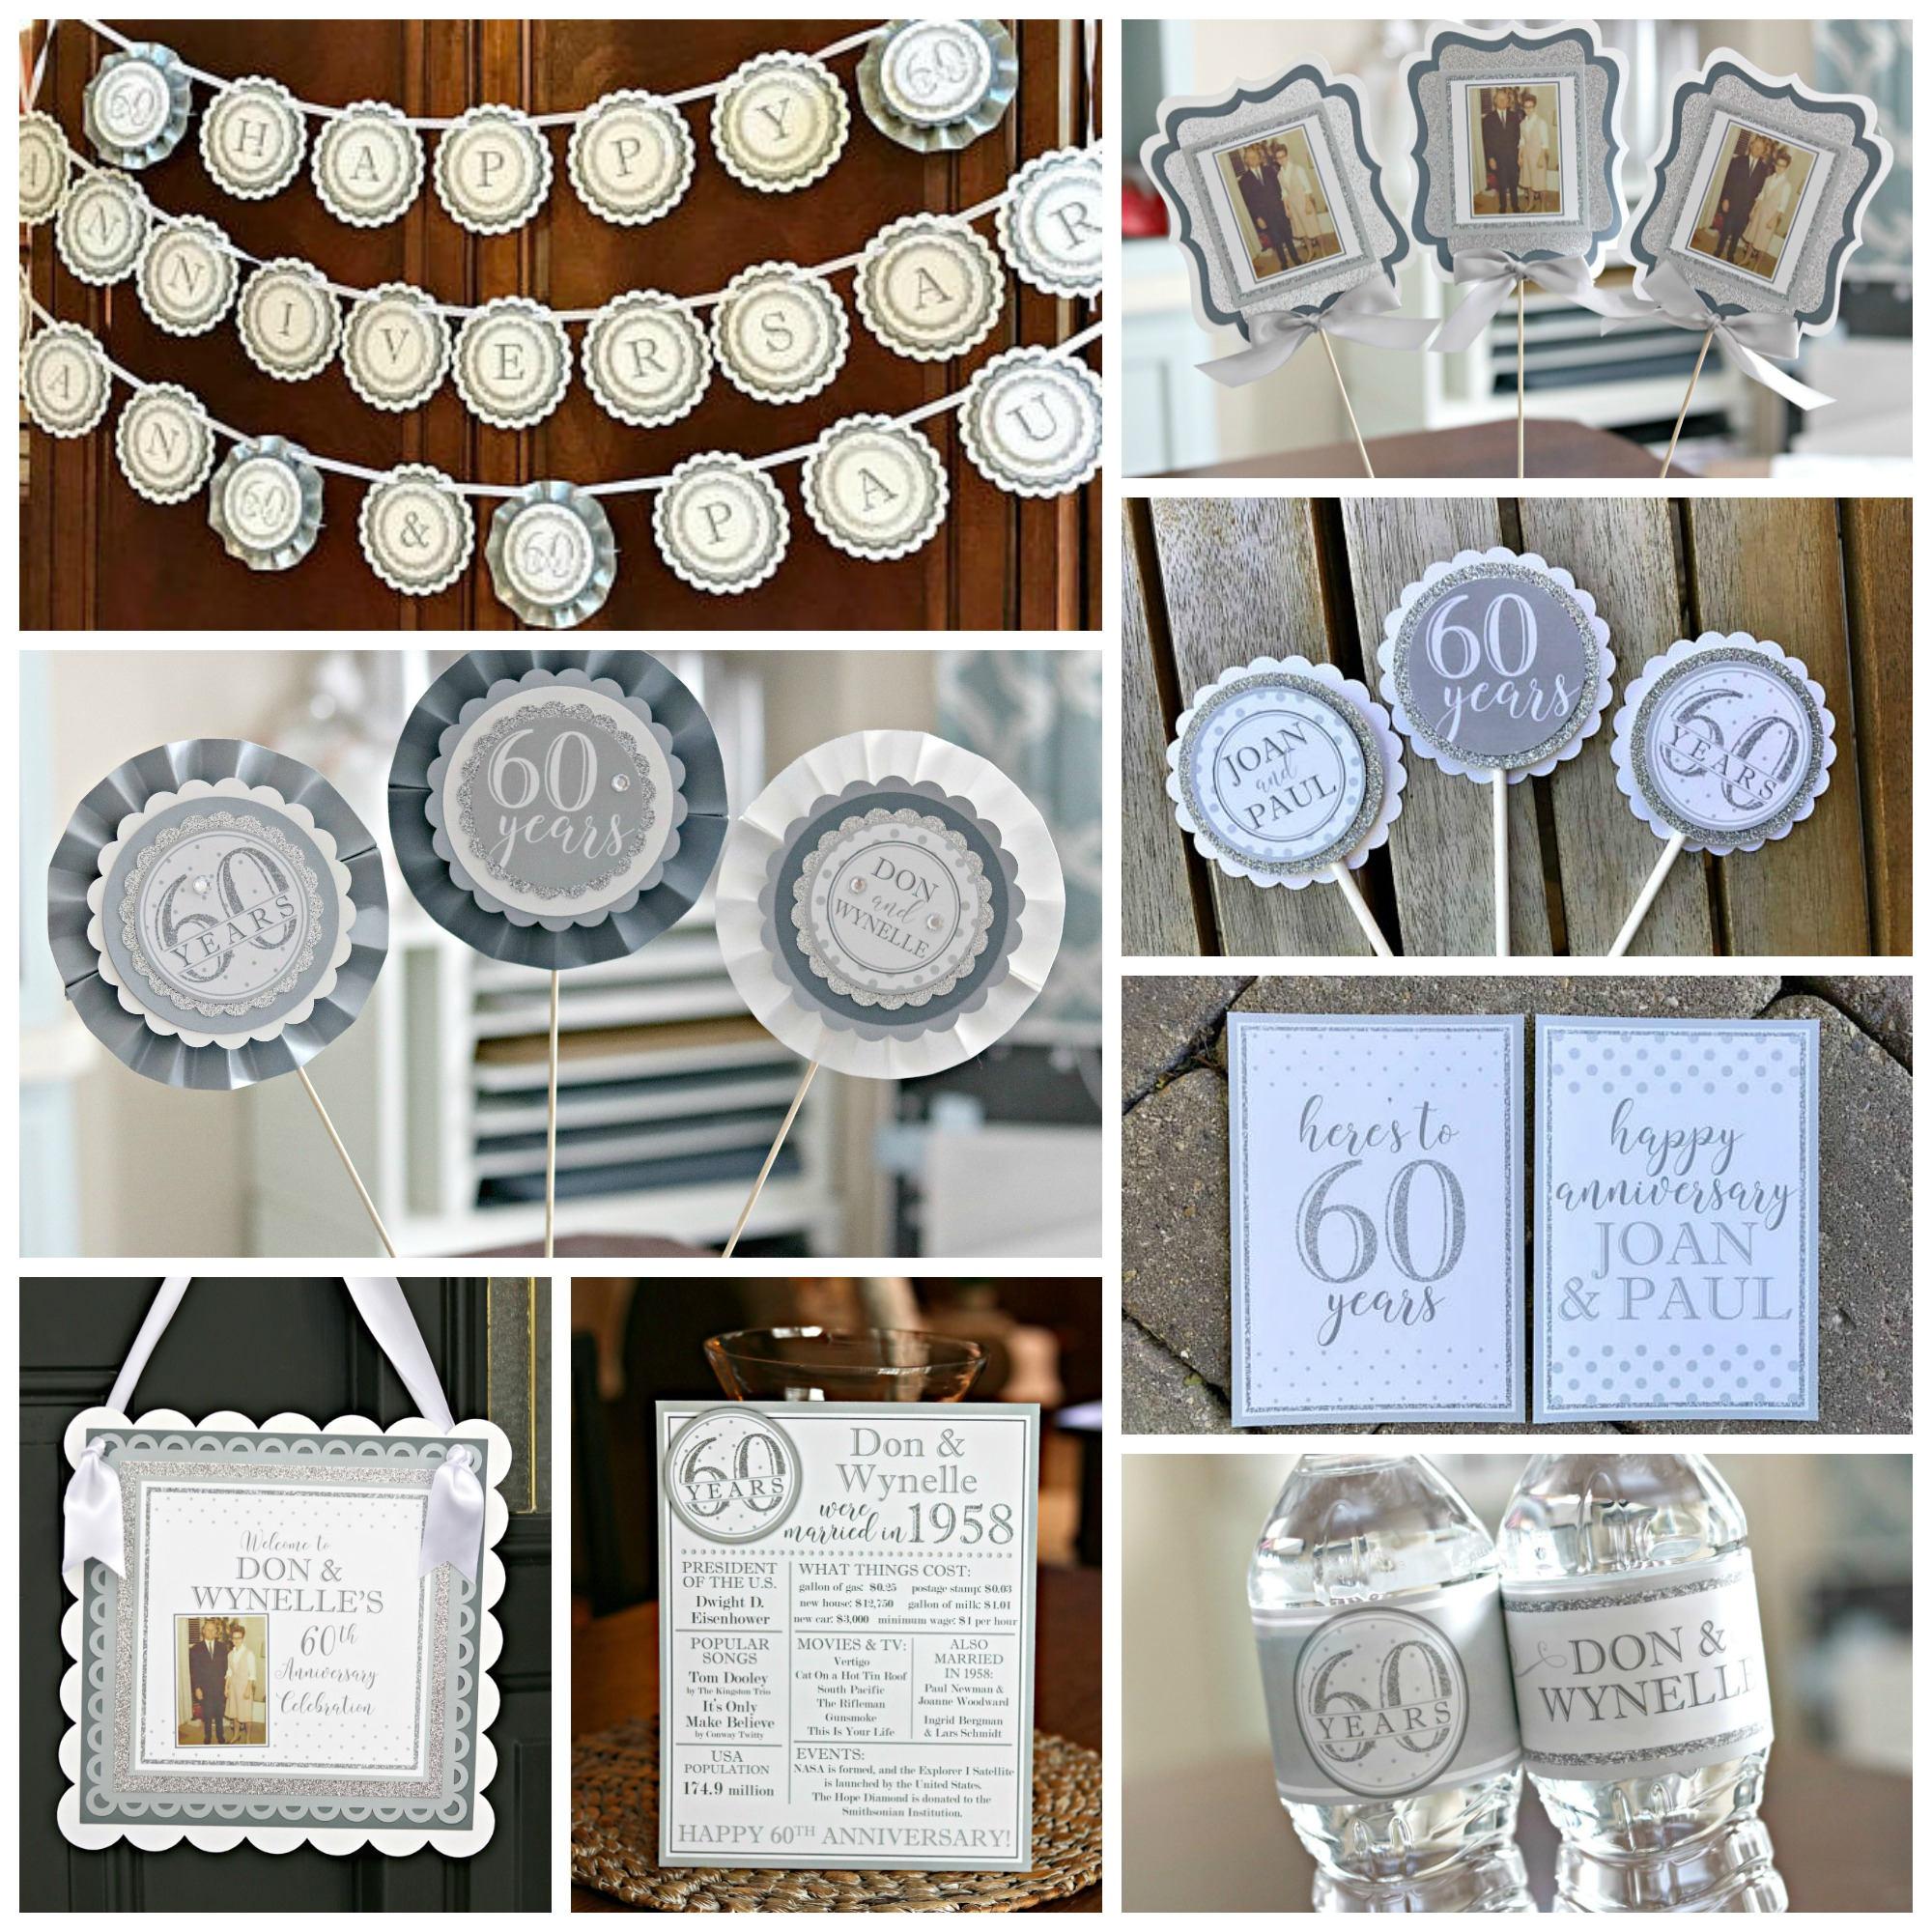 Silver Jubilee Wedding Anniversary Gifts: DIAMOND JUBILEE DECORATIONS 60th Wedding Anniversary